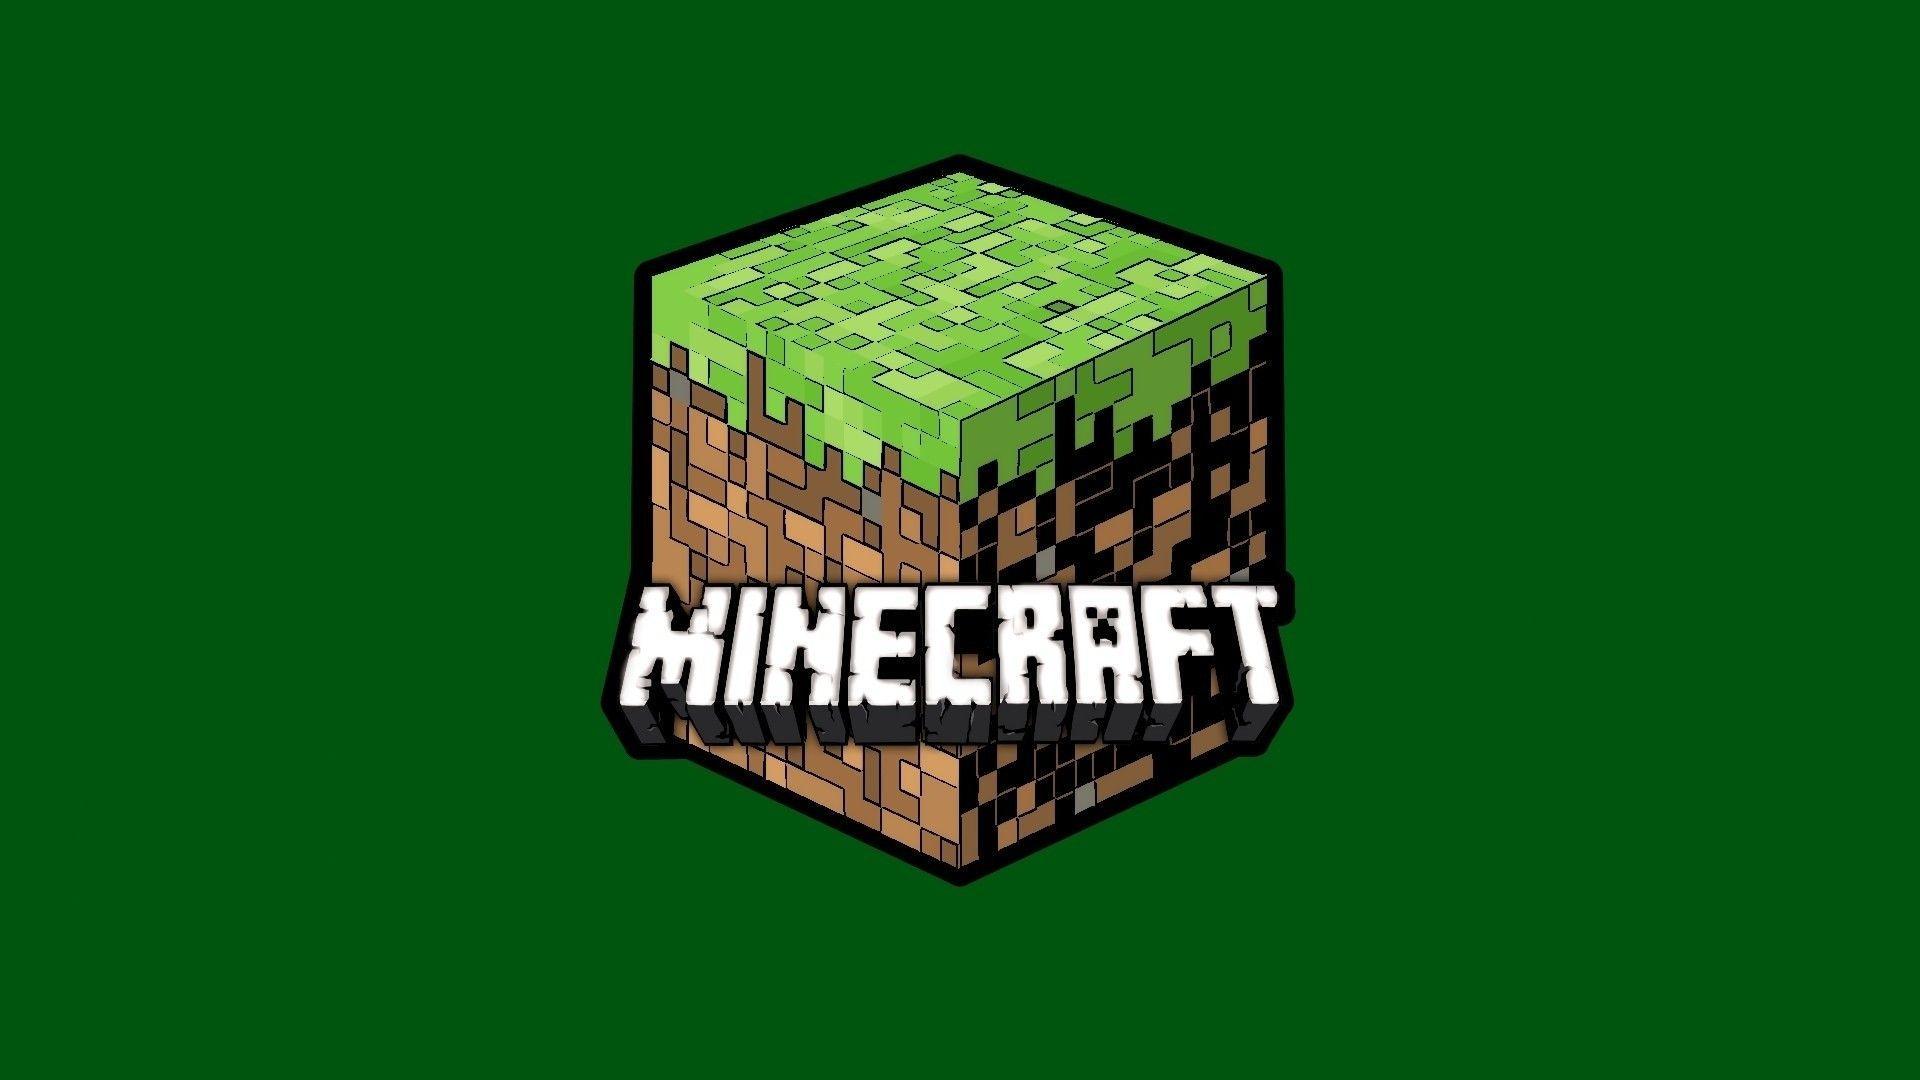 Minecraft Logo Wallpapers Top Free Minecraft Logo Backgrounds Wallpaperaccess